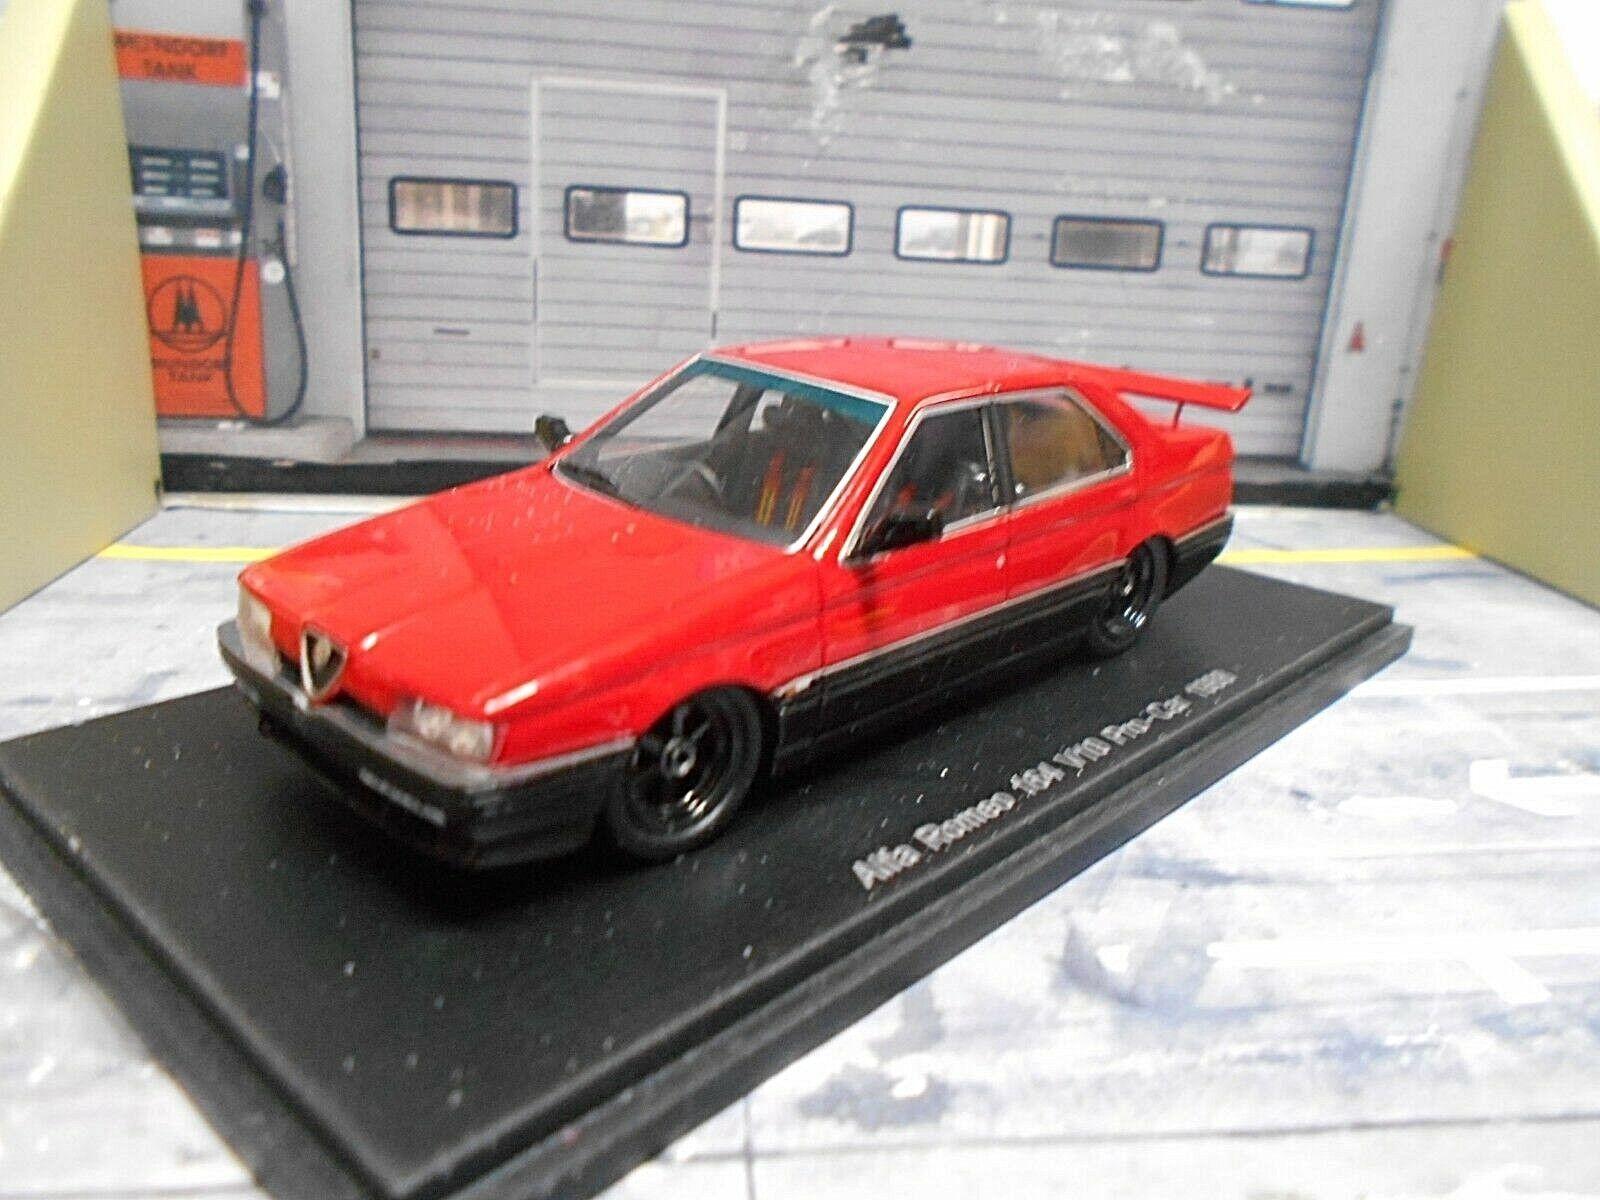 ALFA ROMEO 164 BERLINA v10 PRO CAR ROSSO RED 1988 resin Highend SPARK 1:43